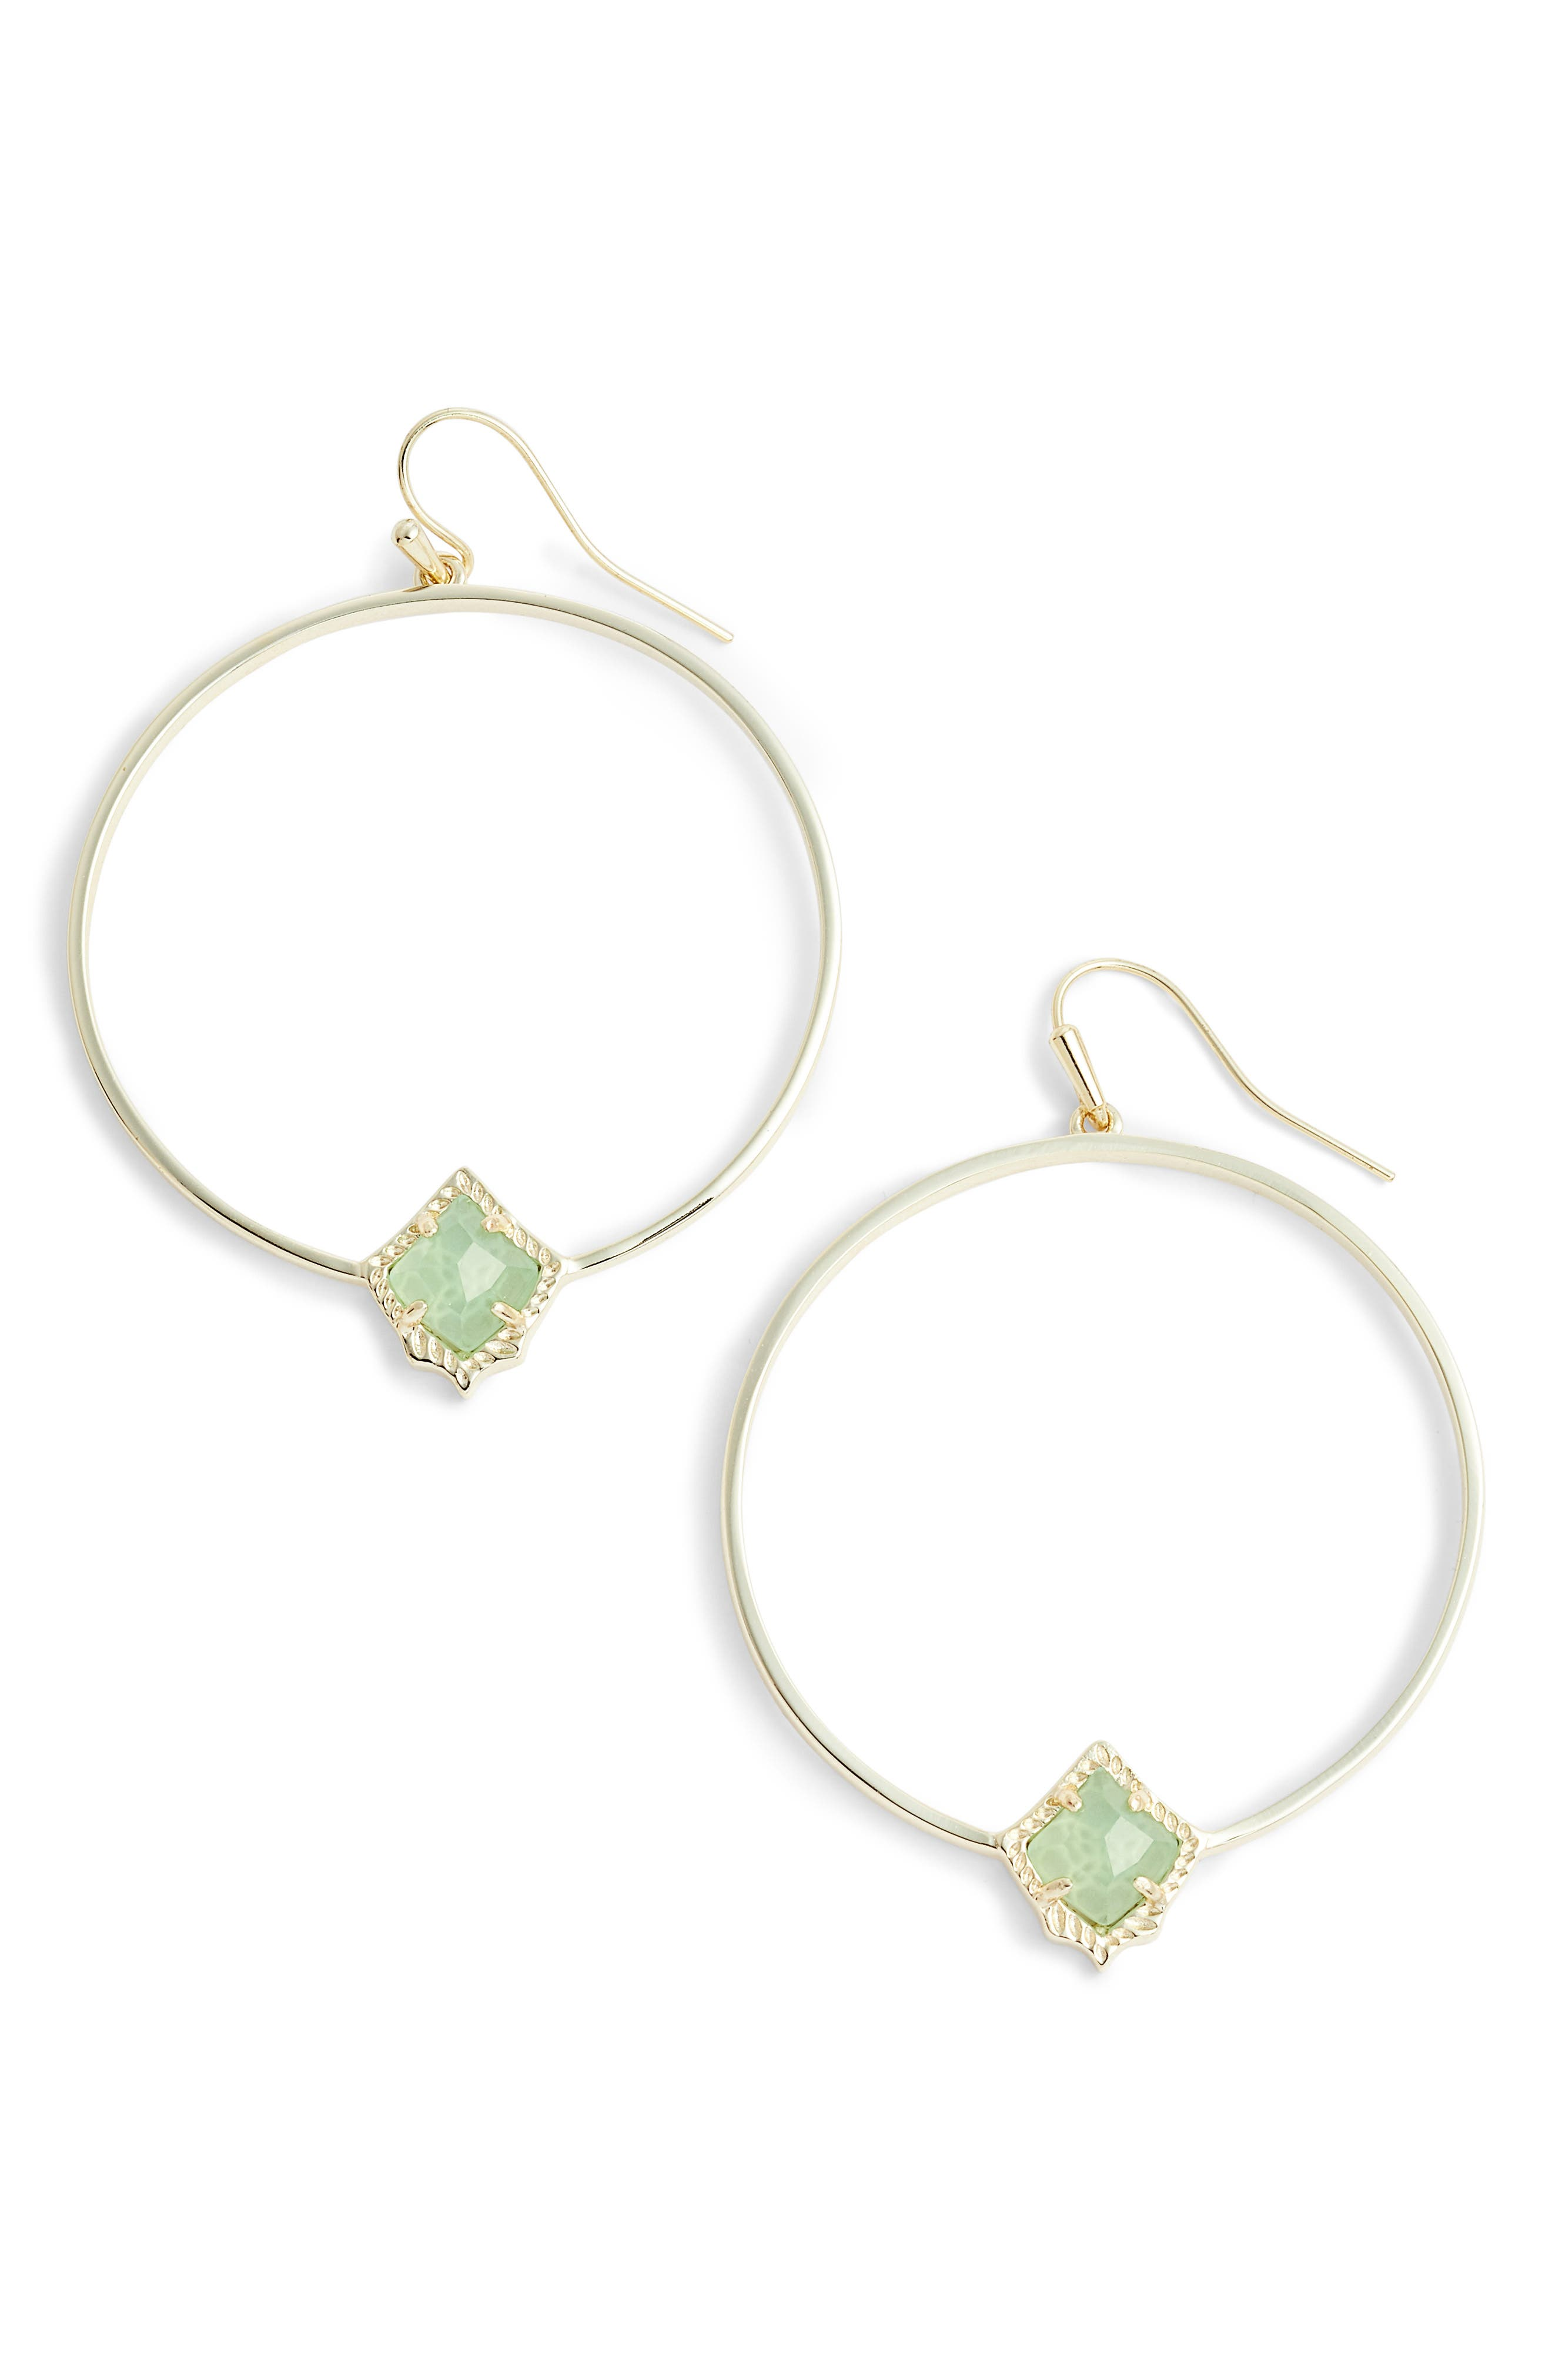 Elberta Hoop Earrings,                             Main thumbnail 1, color,                             Chalcedony/ Gold